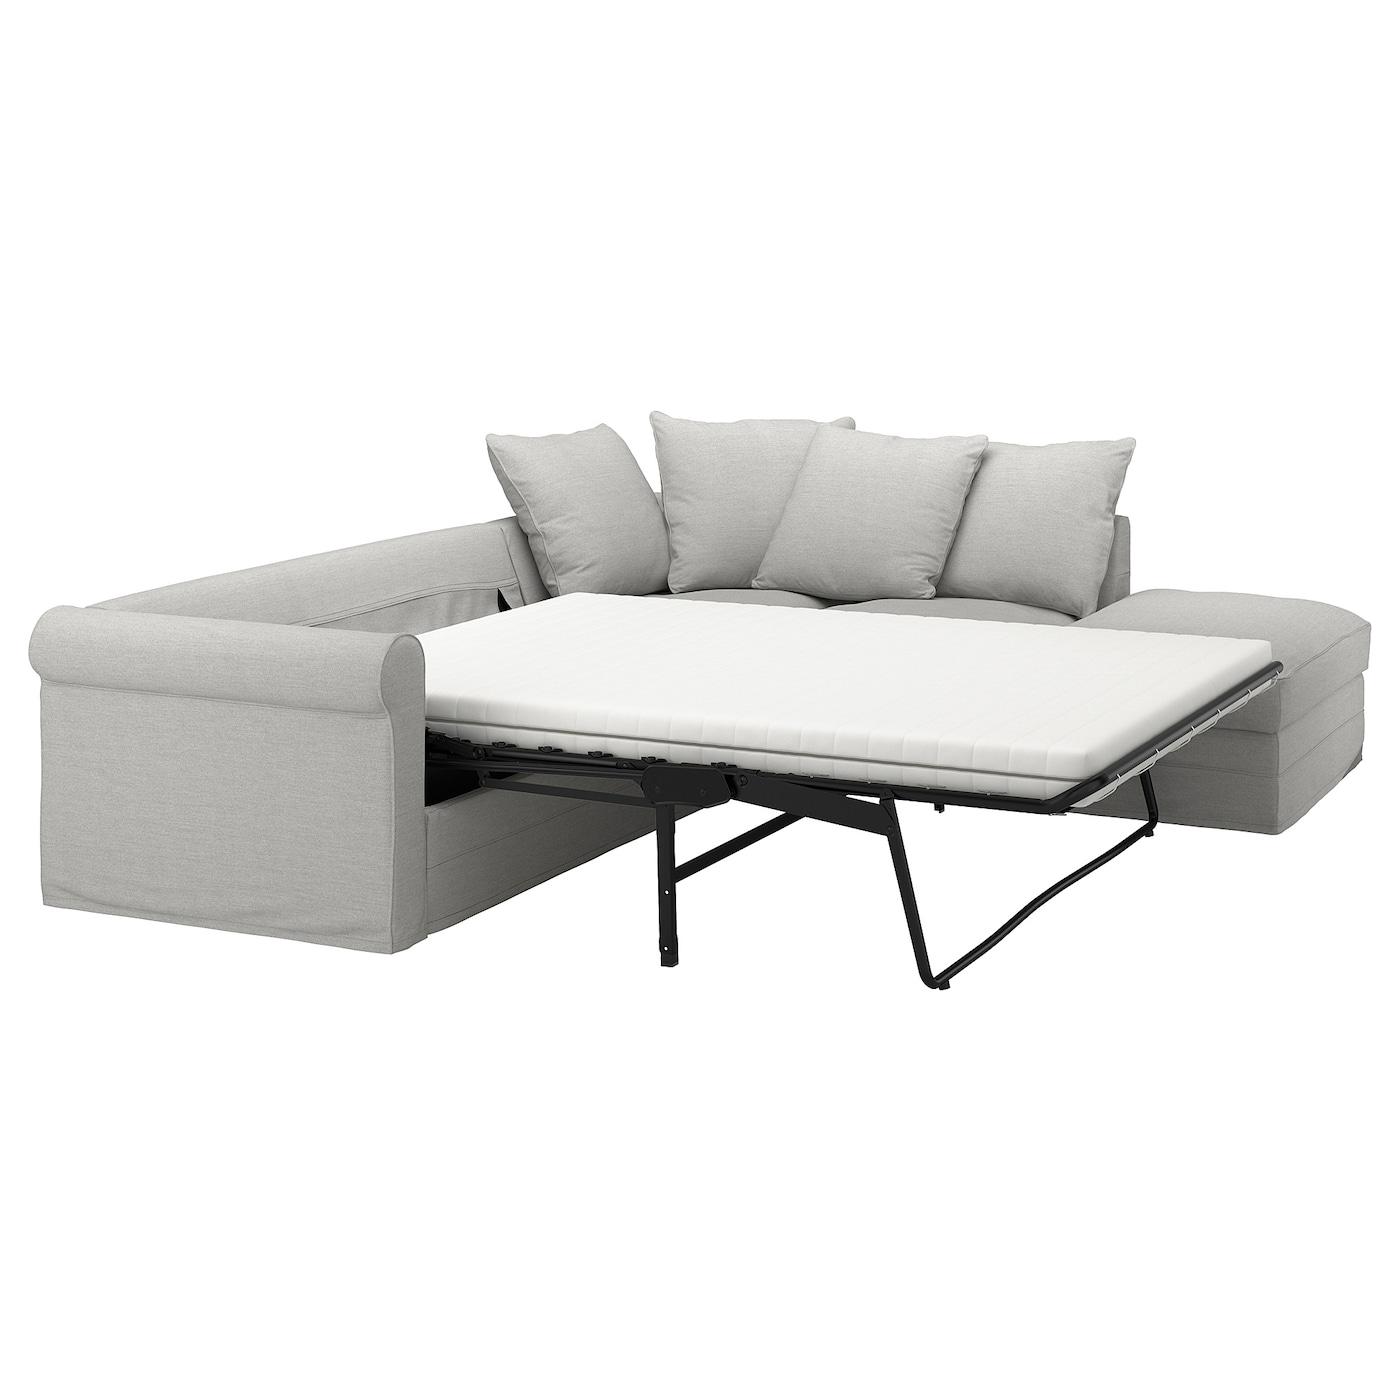 GrÖnlid Corner Sofa Bed 4 Seat With